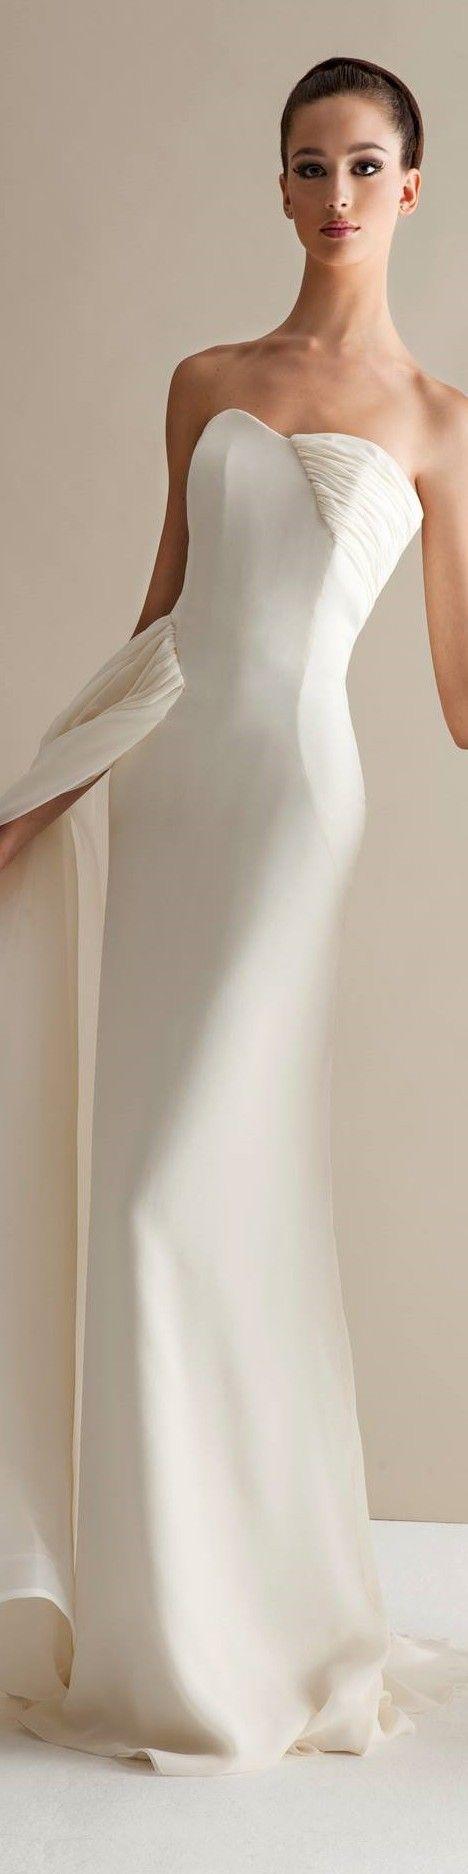 Simple off white wedding dresses   best wedding dress images on Pinterest  Homecoming dresses